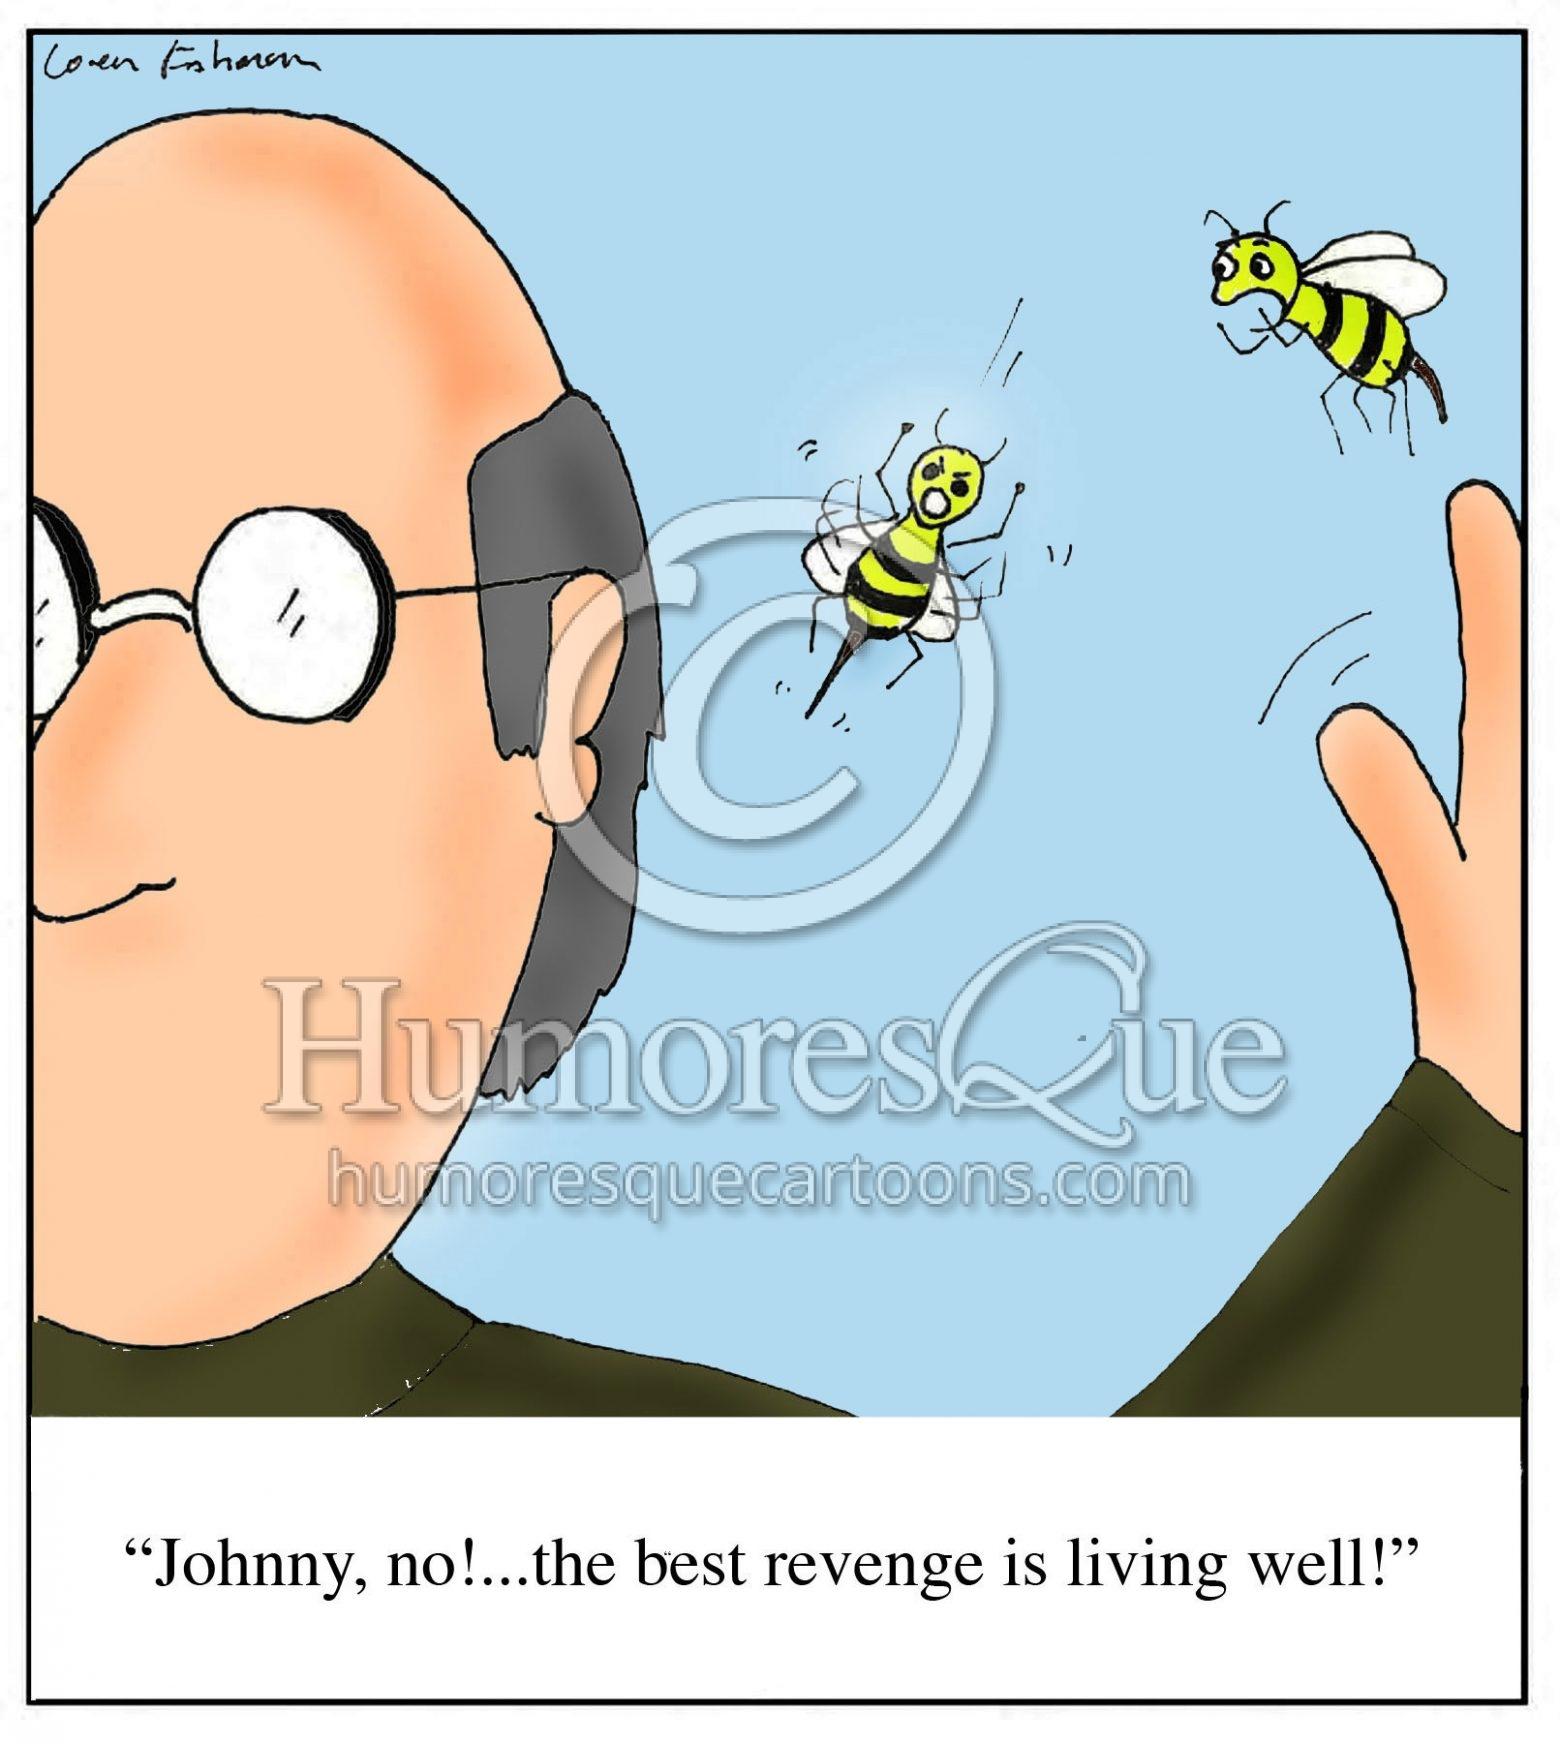 the best revenge is living well bee sting cartoon